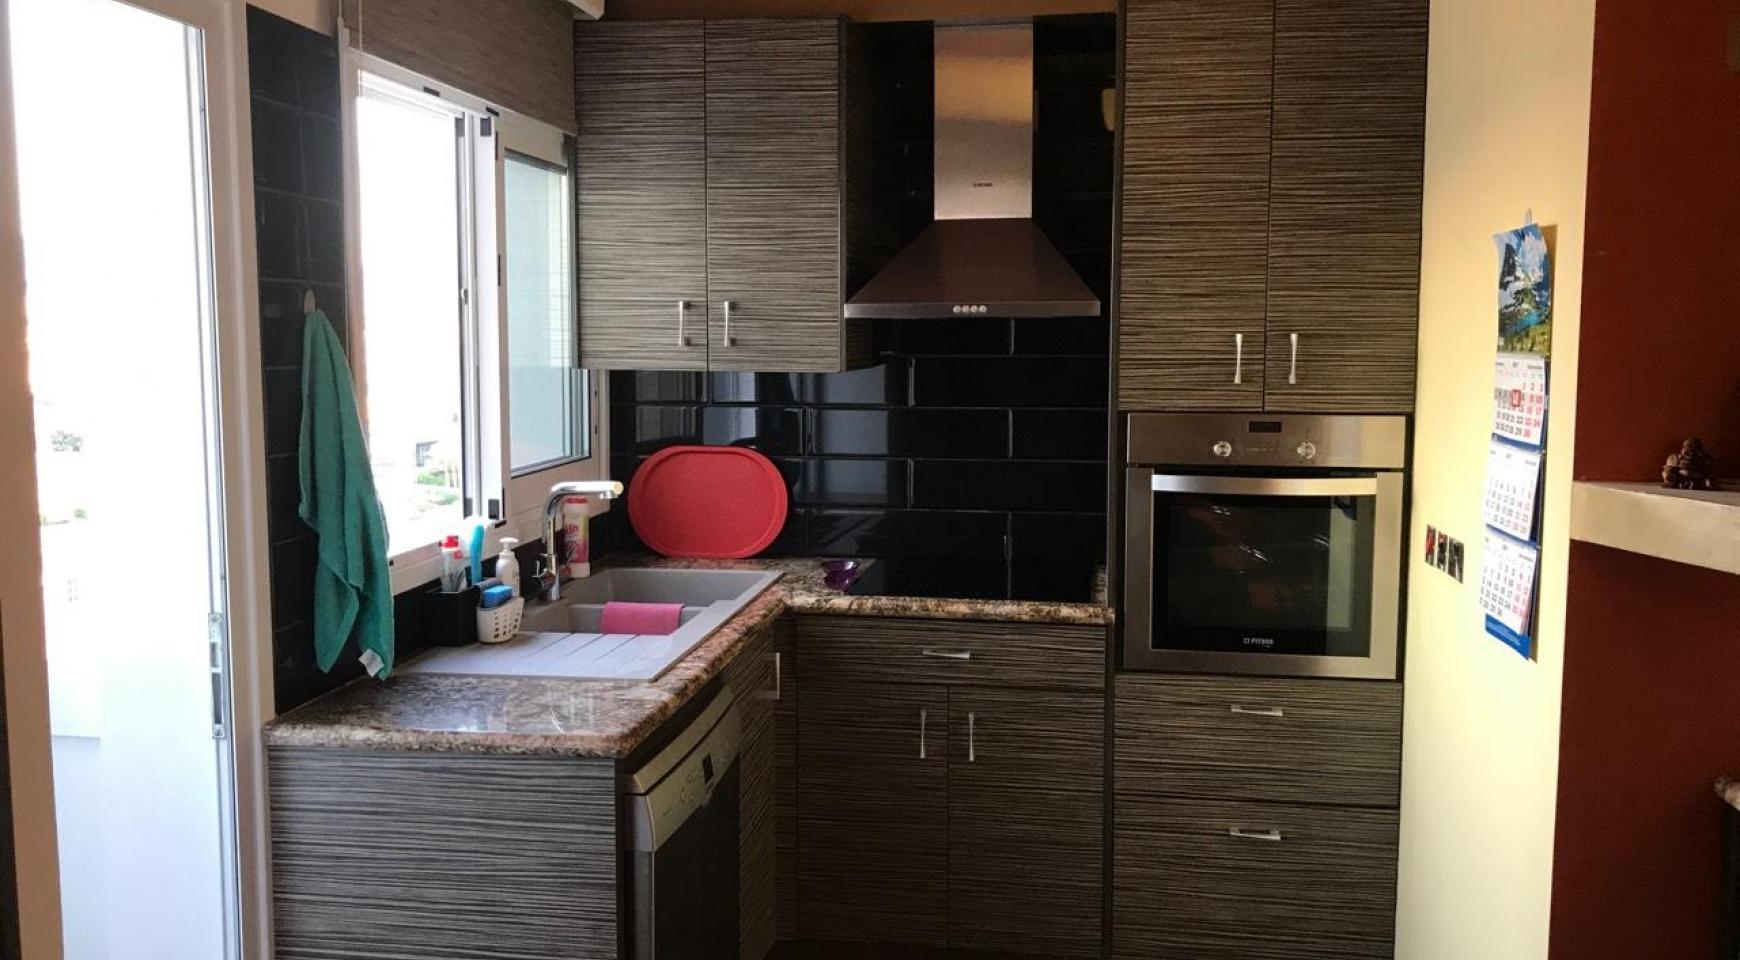 3 Bedroom Apartment in Molos Area near Limassol Marina - 7